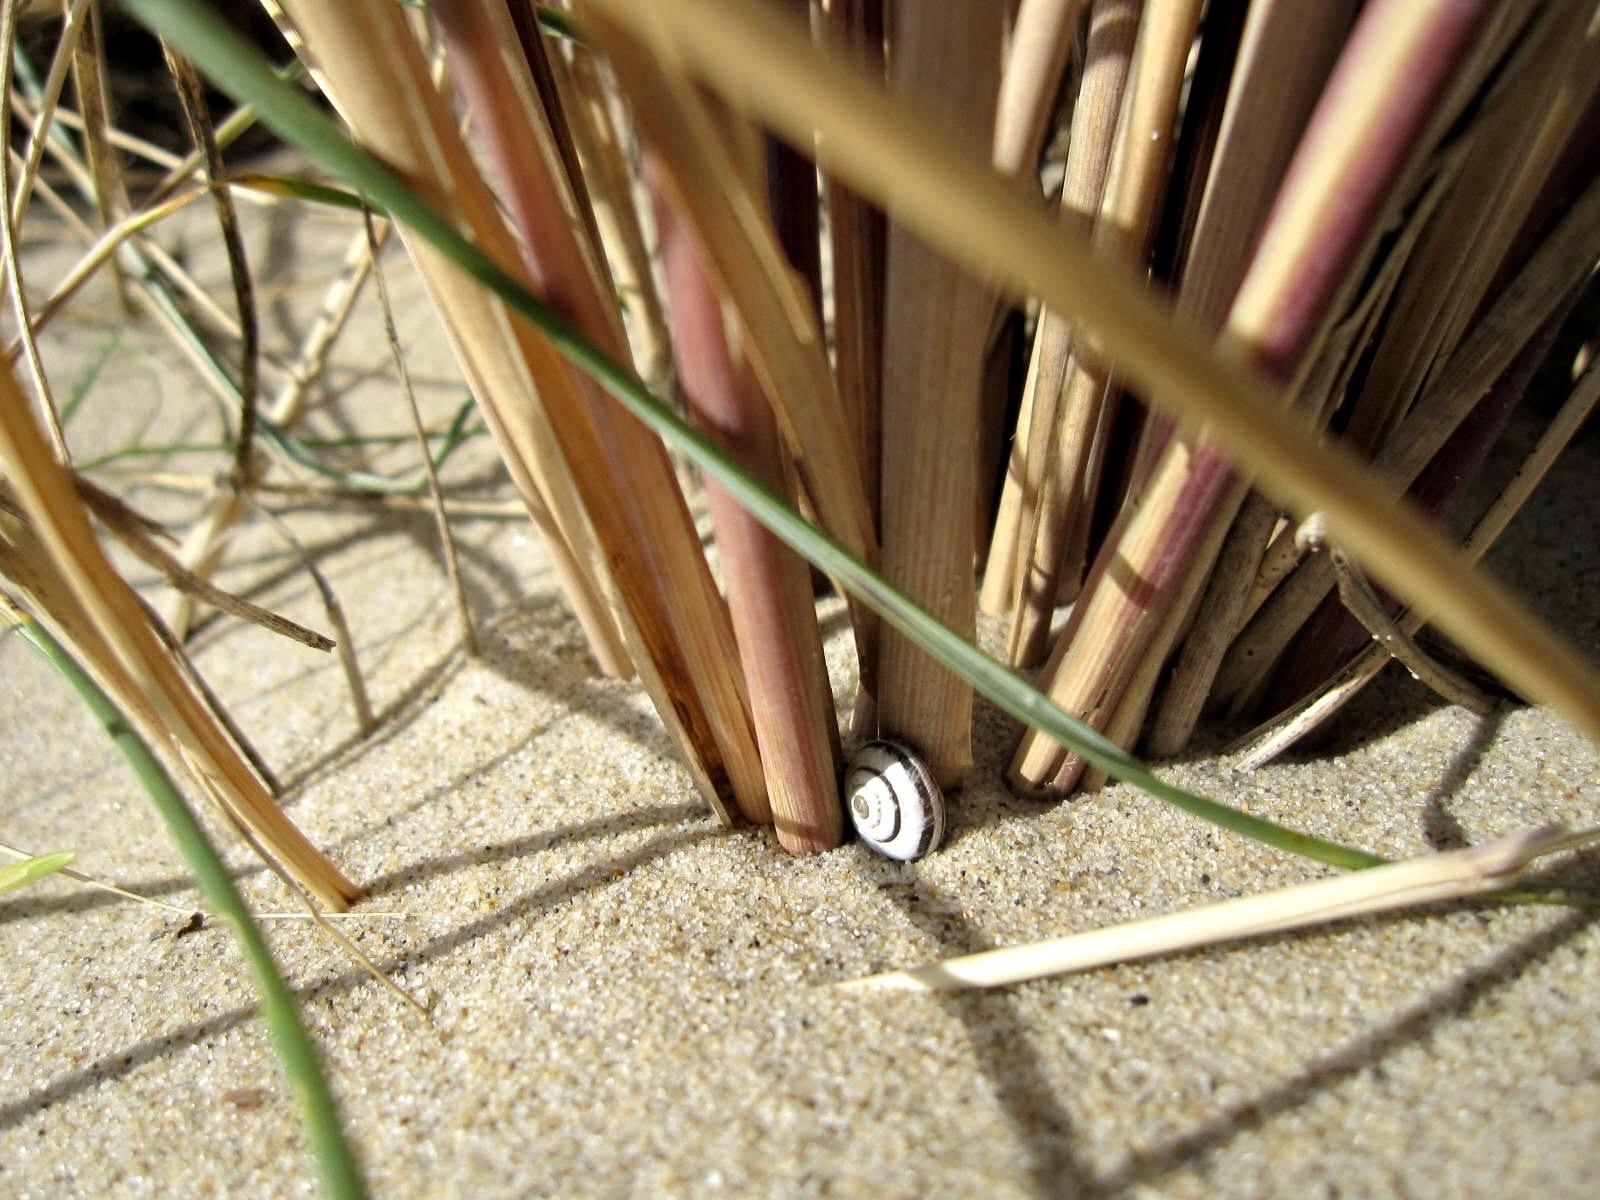 Snakeshell by daretobemad